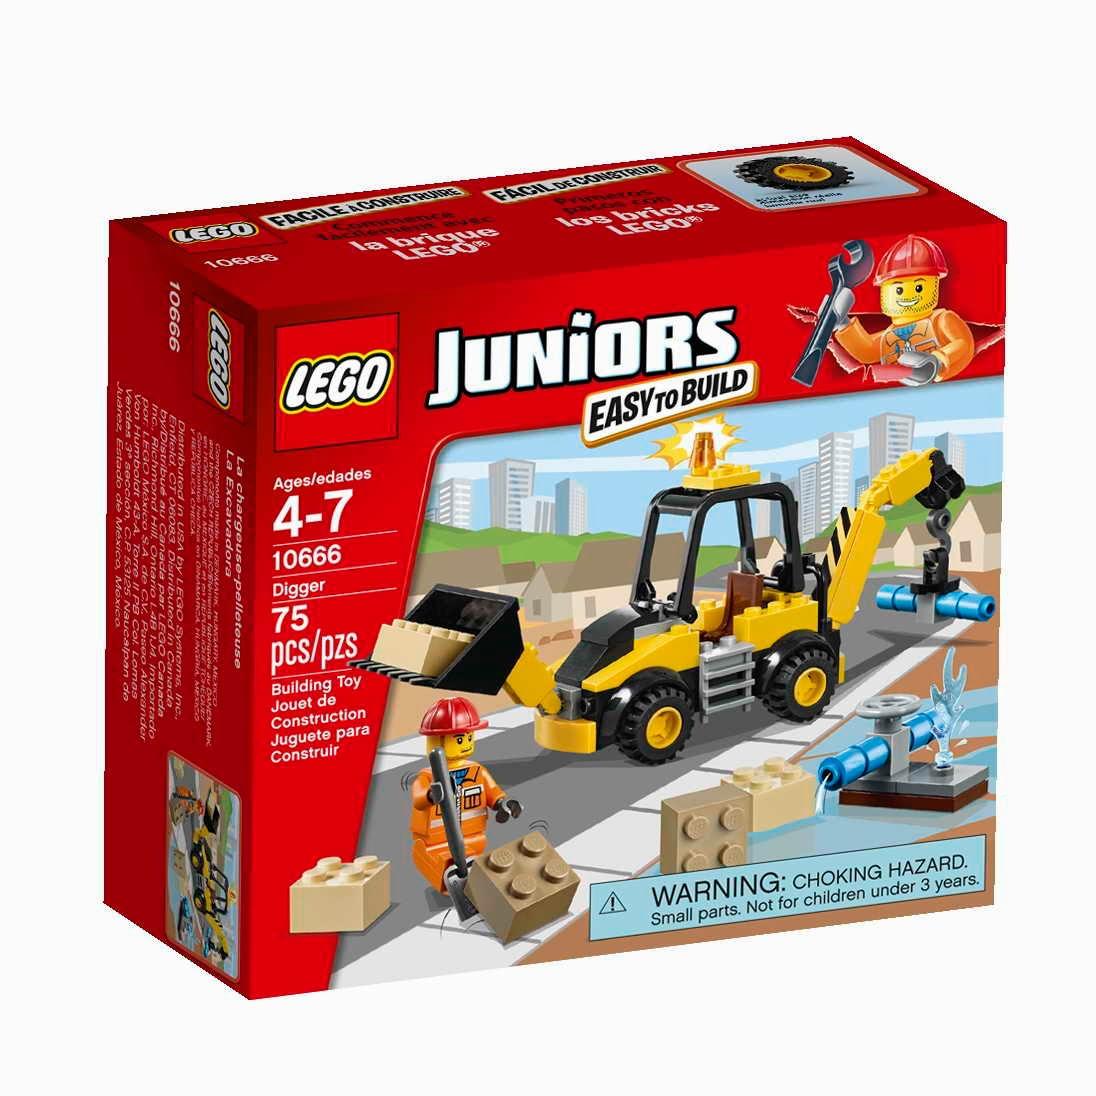 LEGO Juniors 10666 Bagr